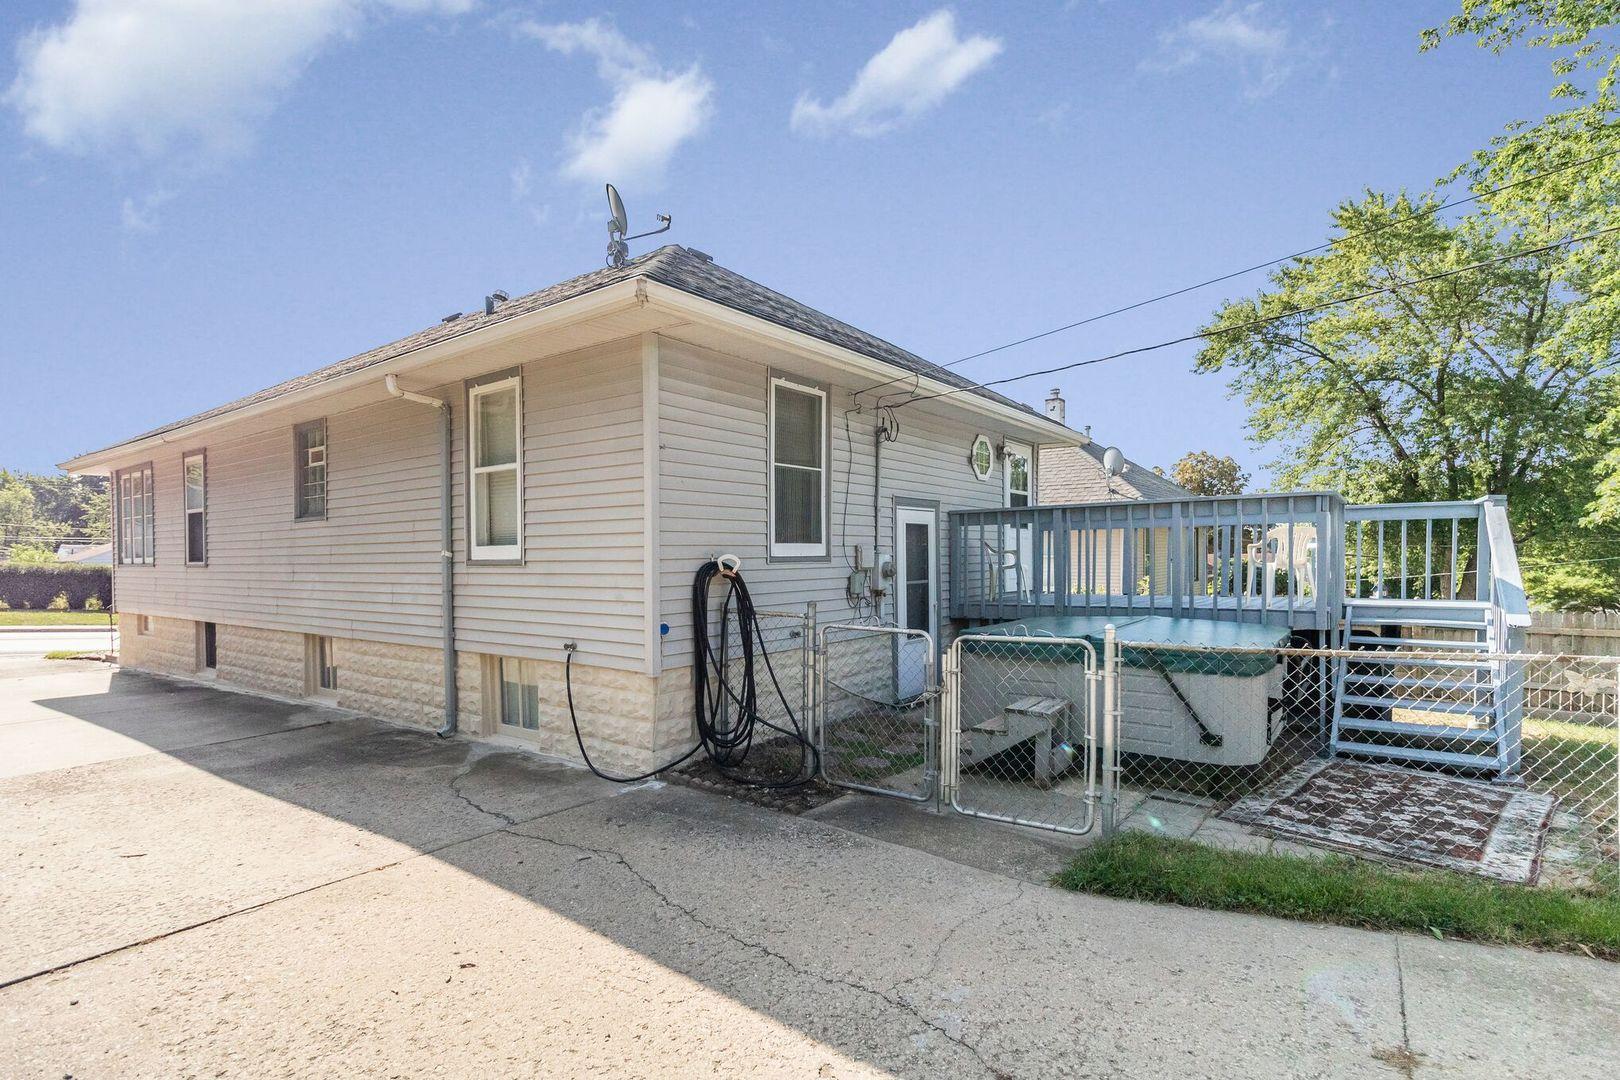 309 North BRIGGS, Joliet, Illinois, 60432